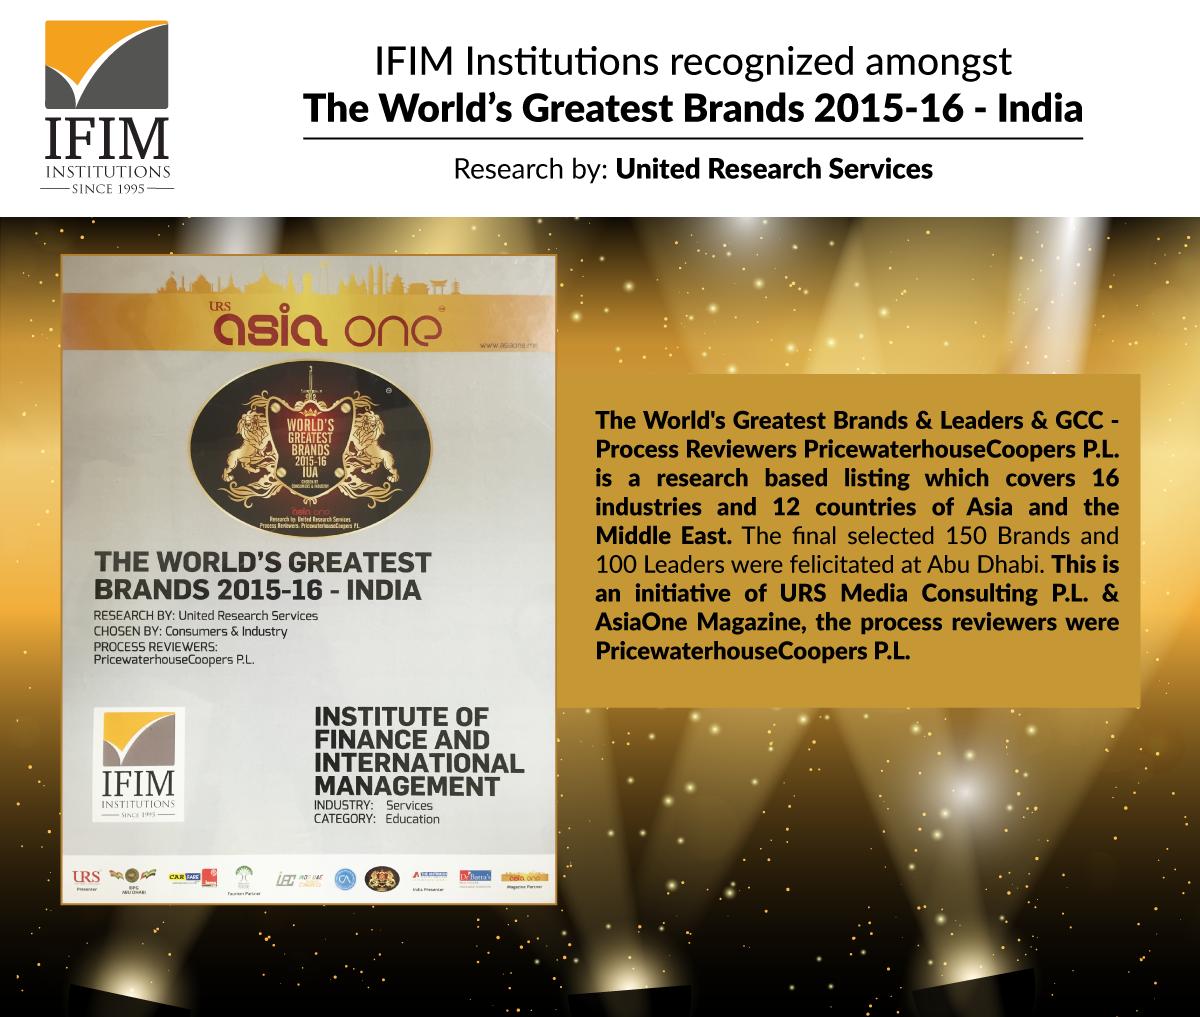 IFIM World's Greatest Brands in India